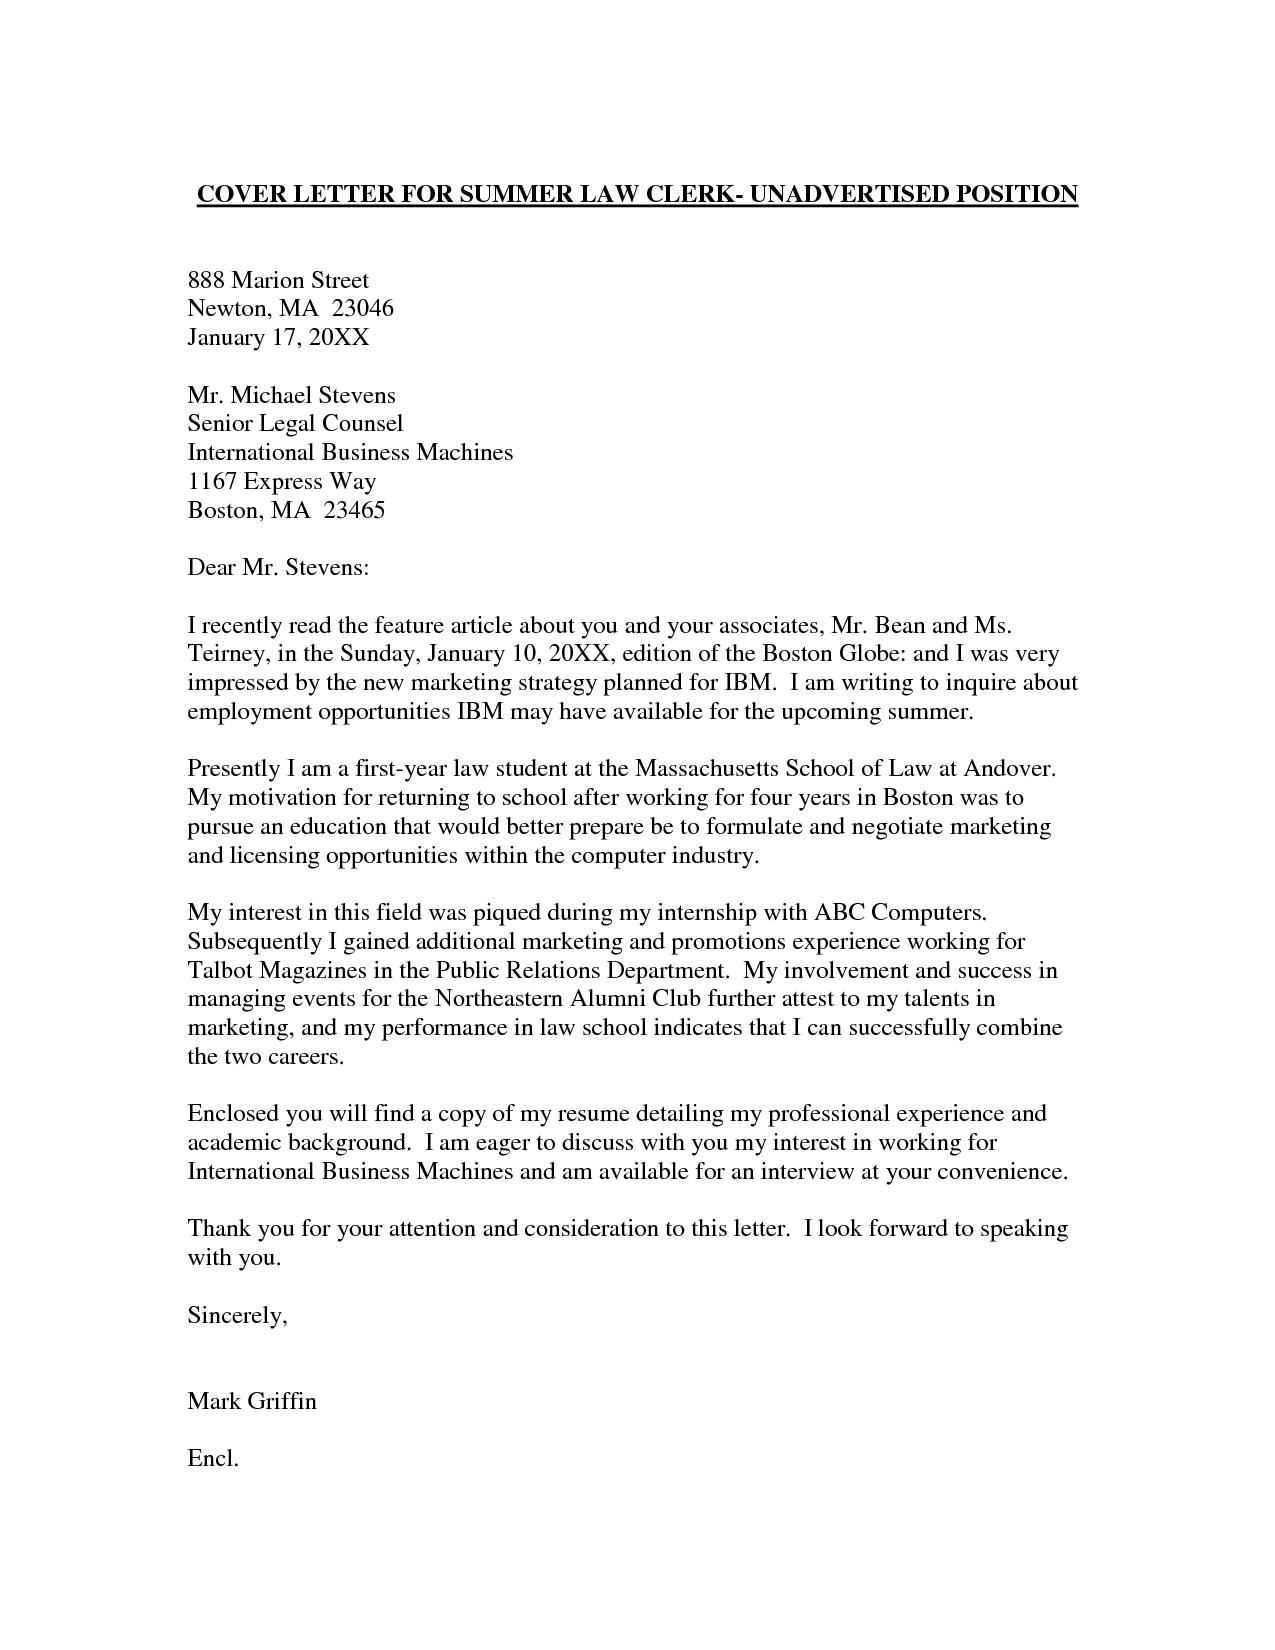 It Expert Cover Letter | Career Development Specialist Cover Letter ...